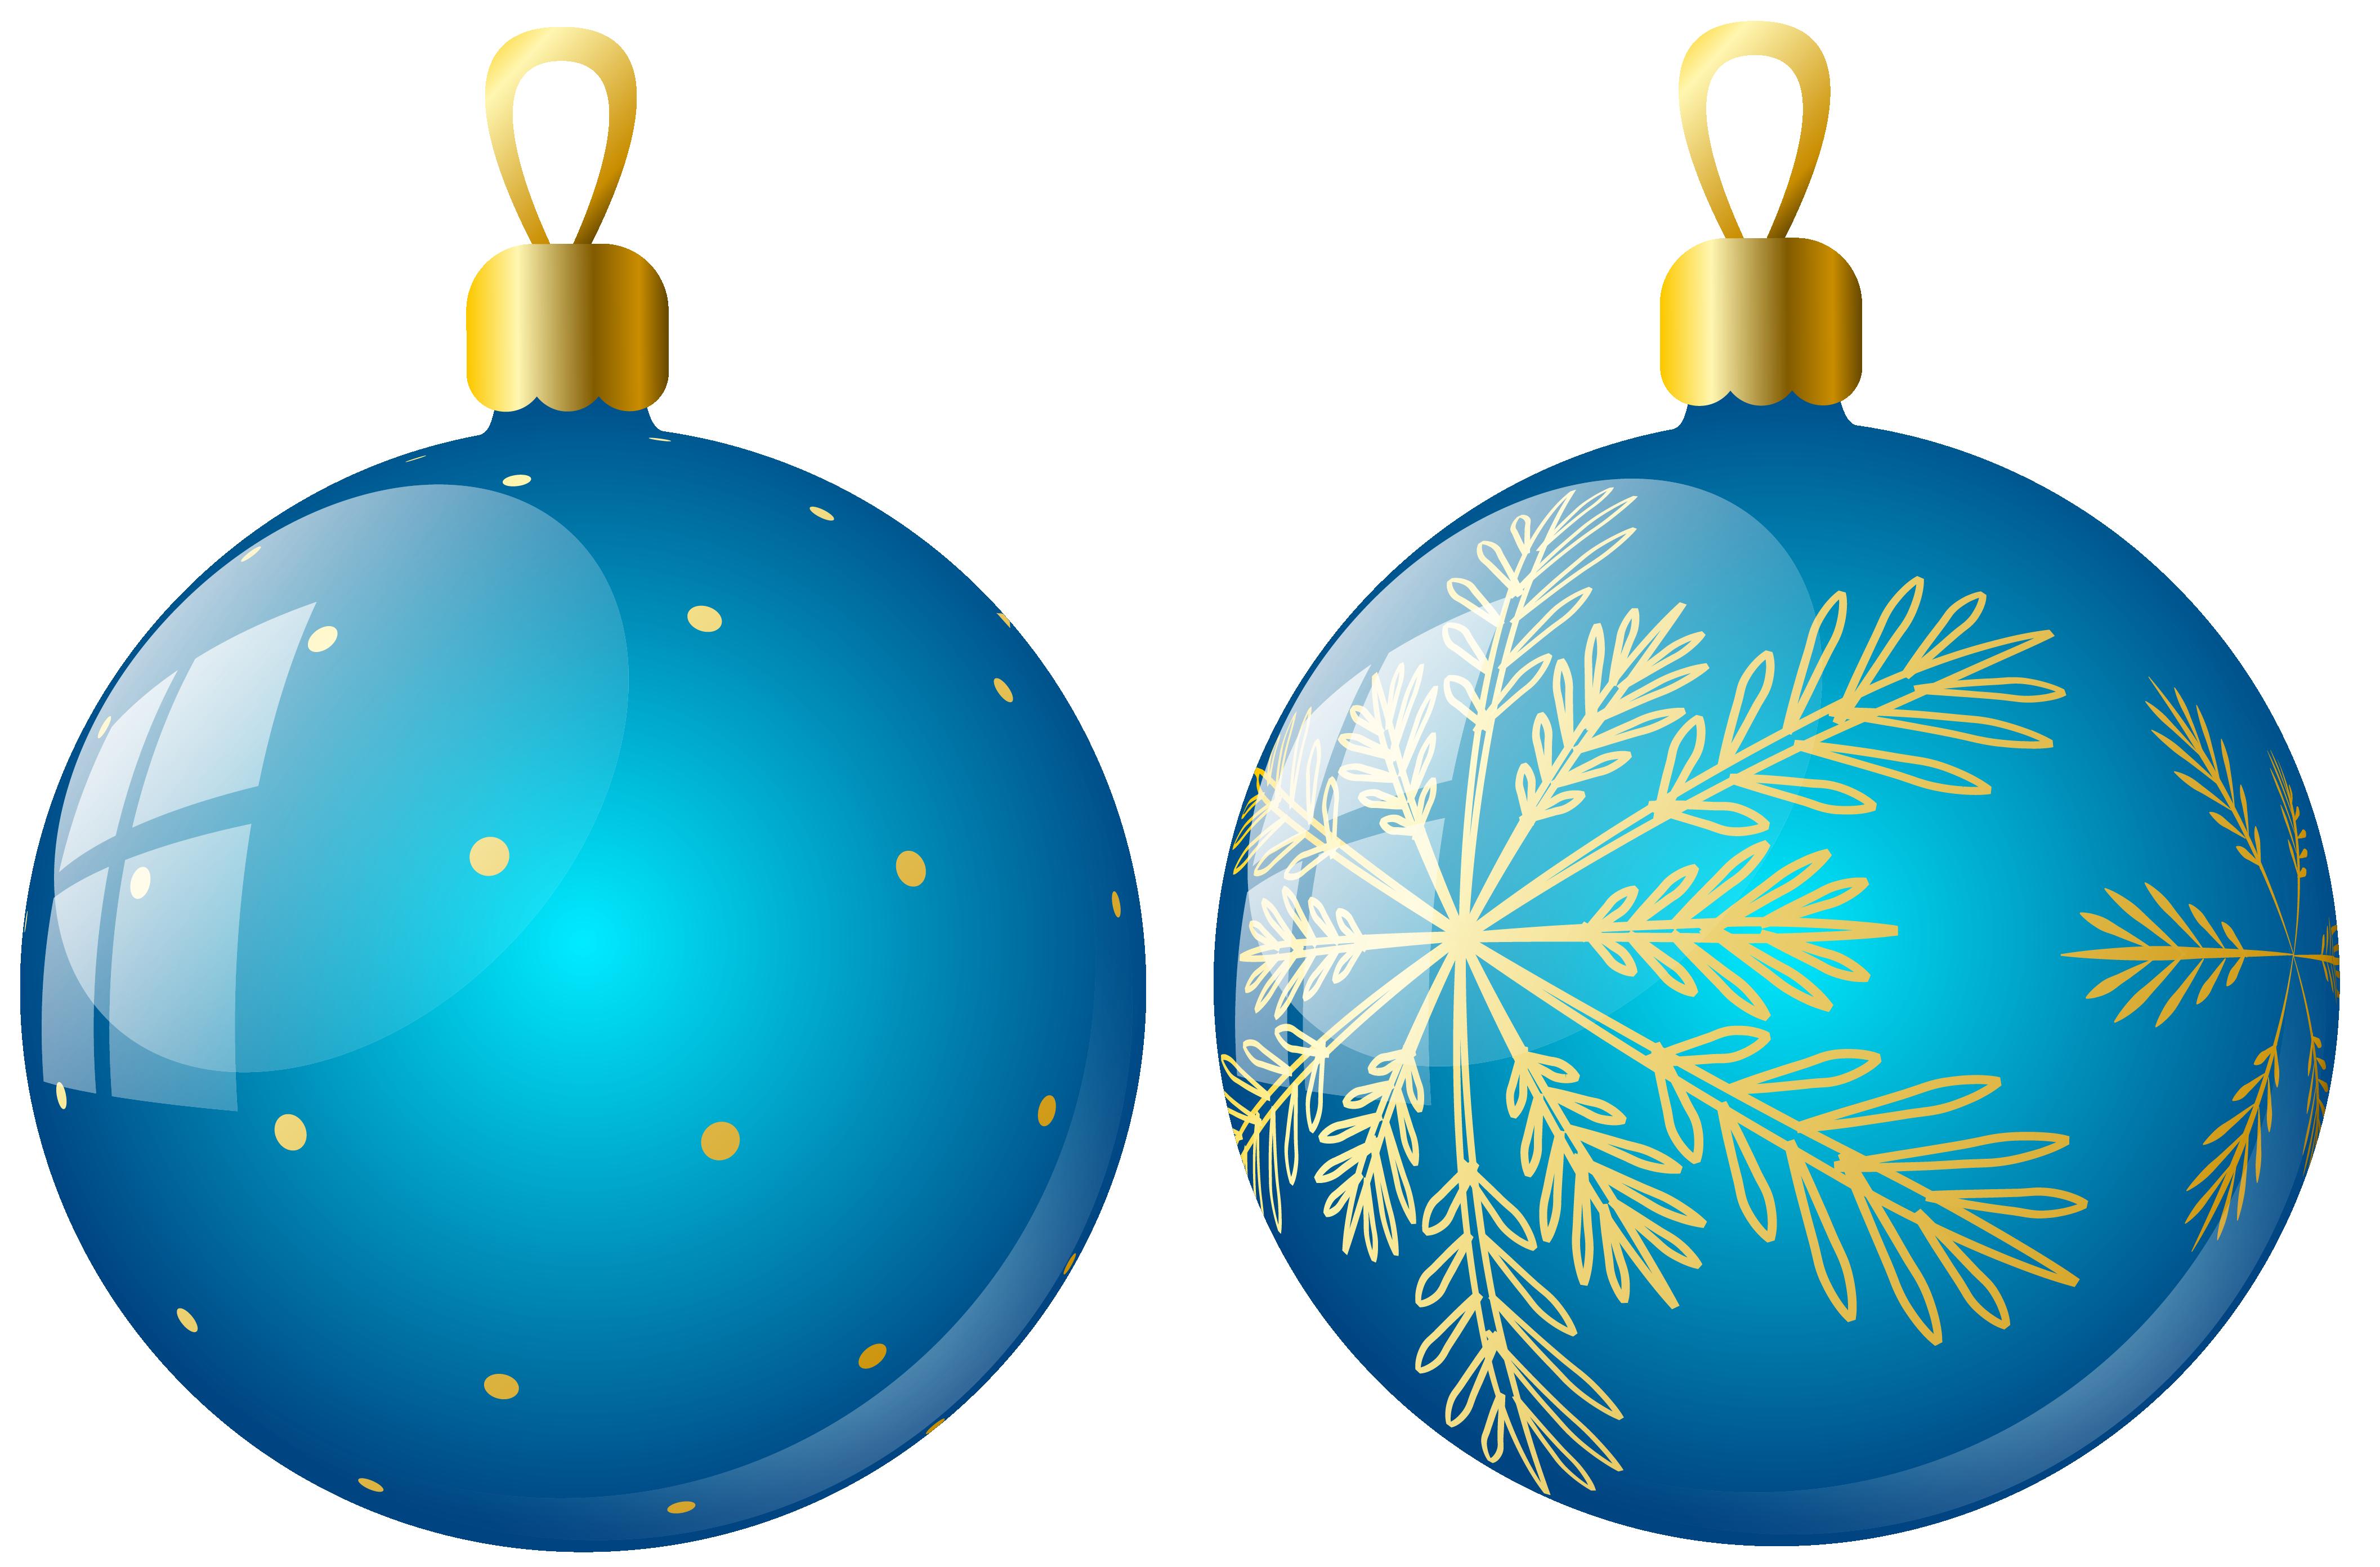 Transparent Two Blue Christmas Balls Ornaments Clipart.